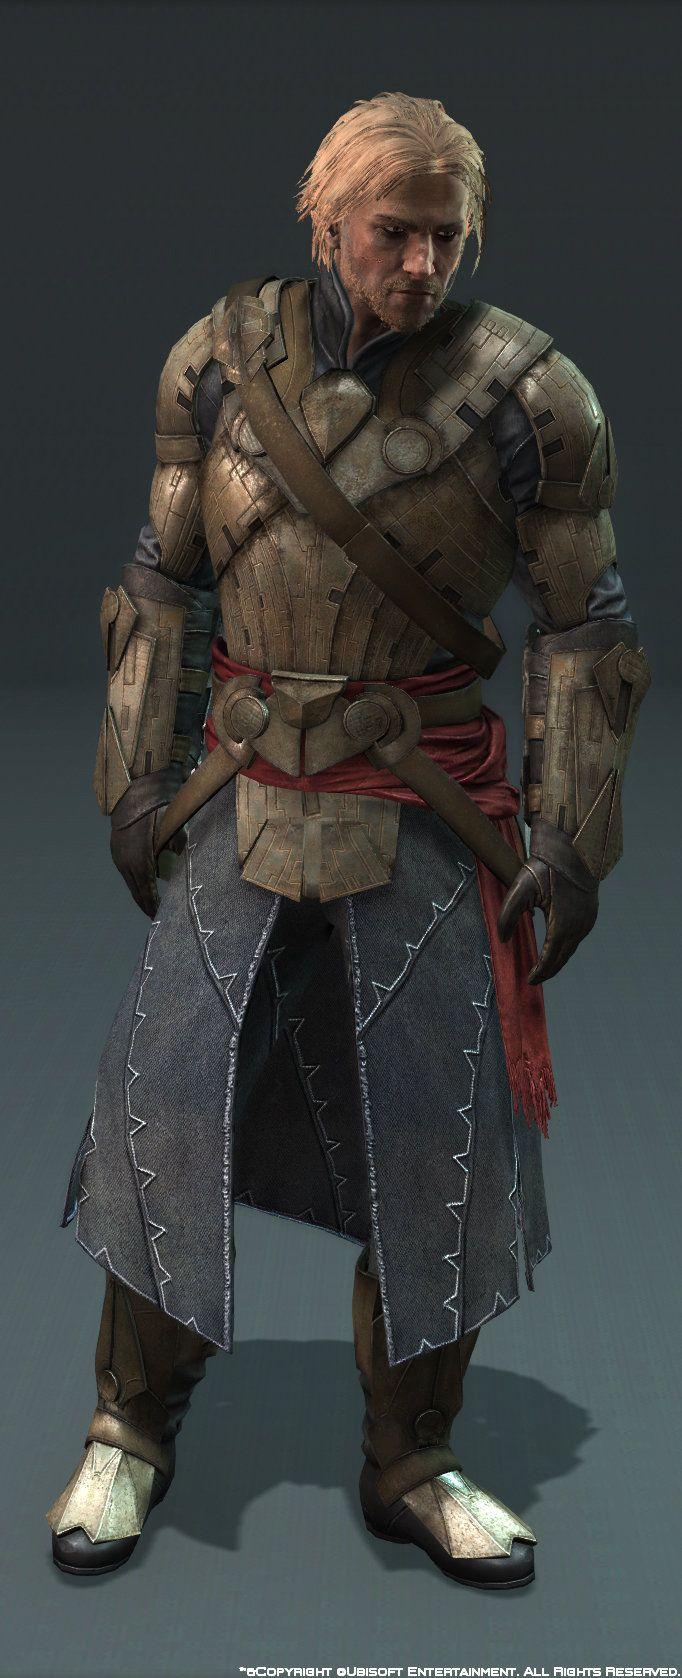 Assasin S Creed Black Flag Edward Kenway Mayan Outfit Mathieu Goulet Assassins Creed Black Flag Assasins Creed Assassins Creed